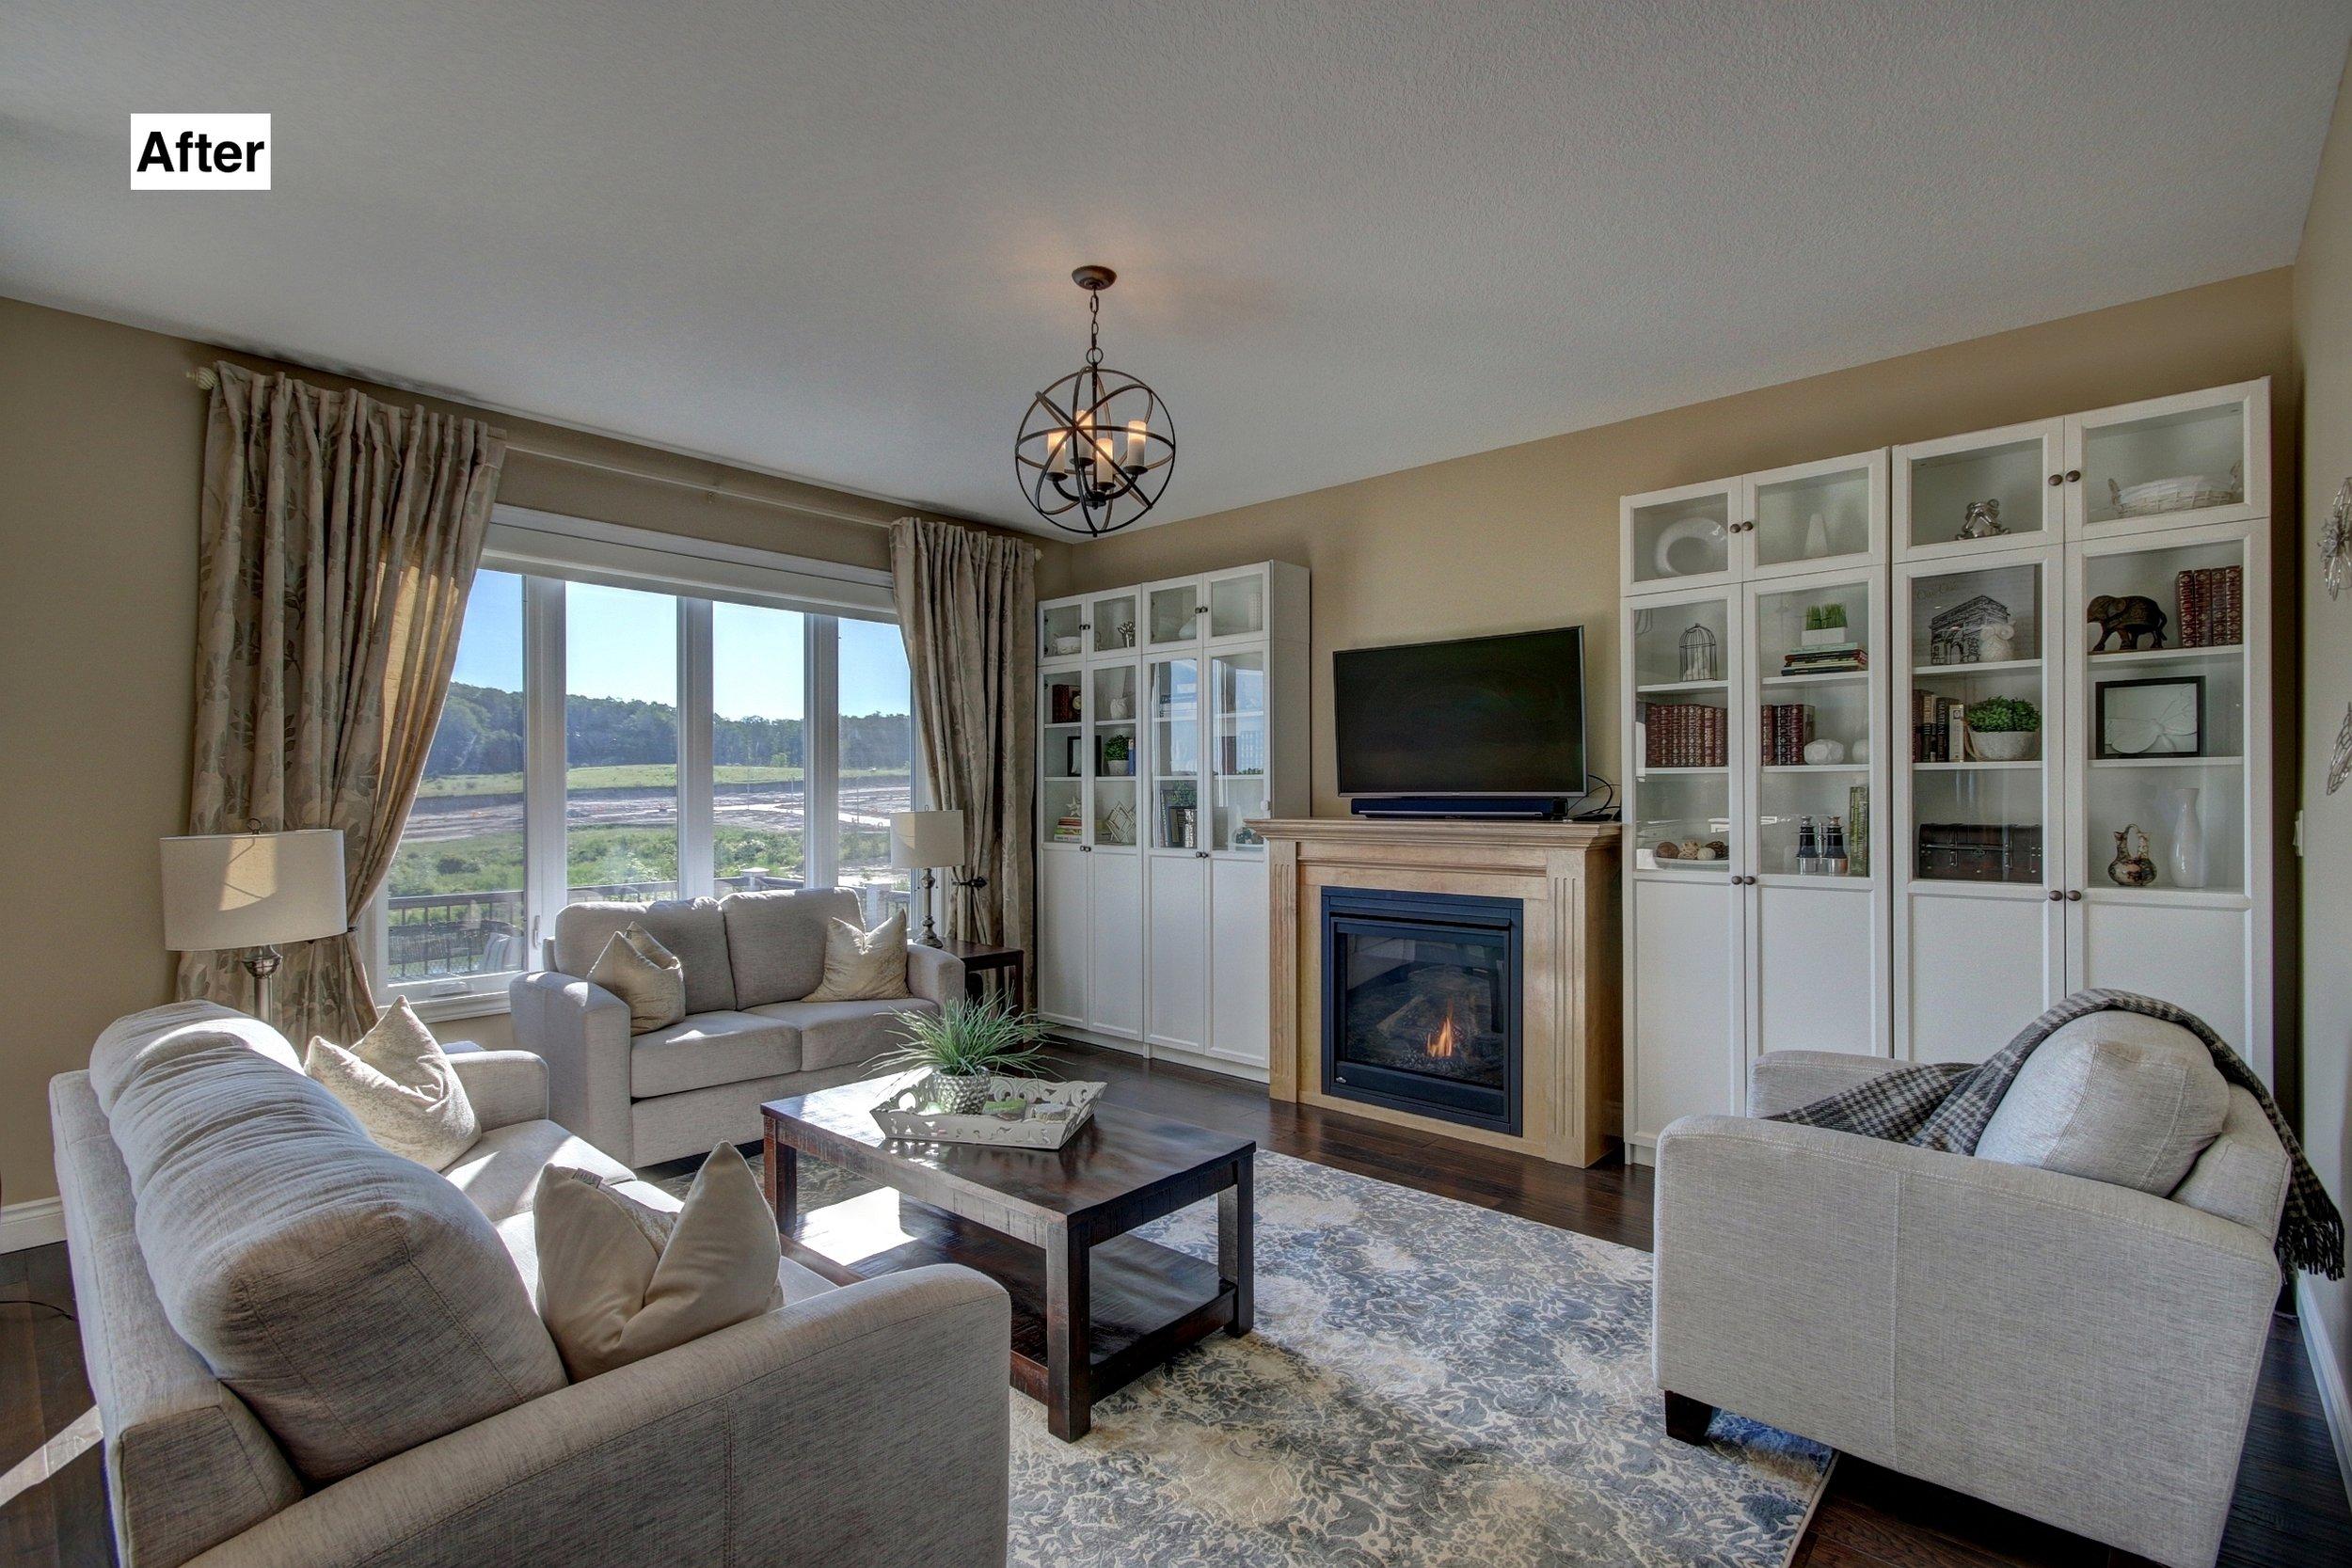 TW living room - after.jpg